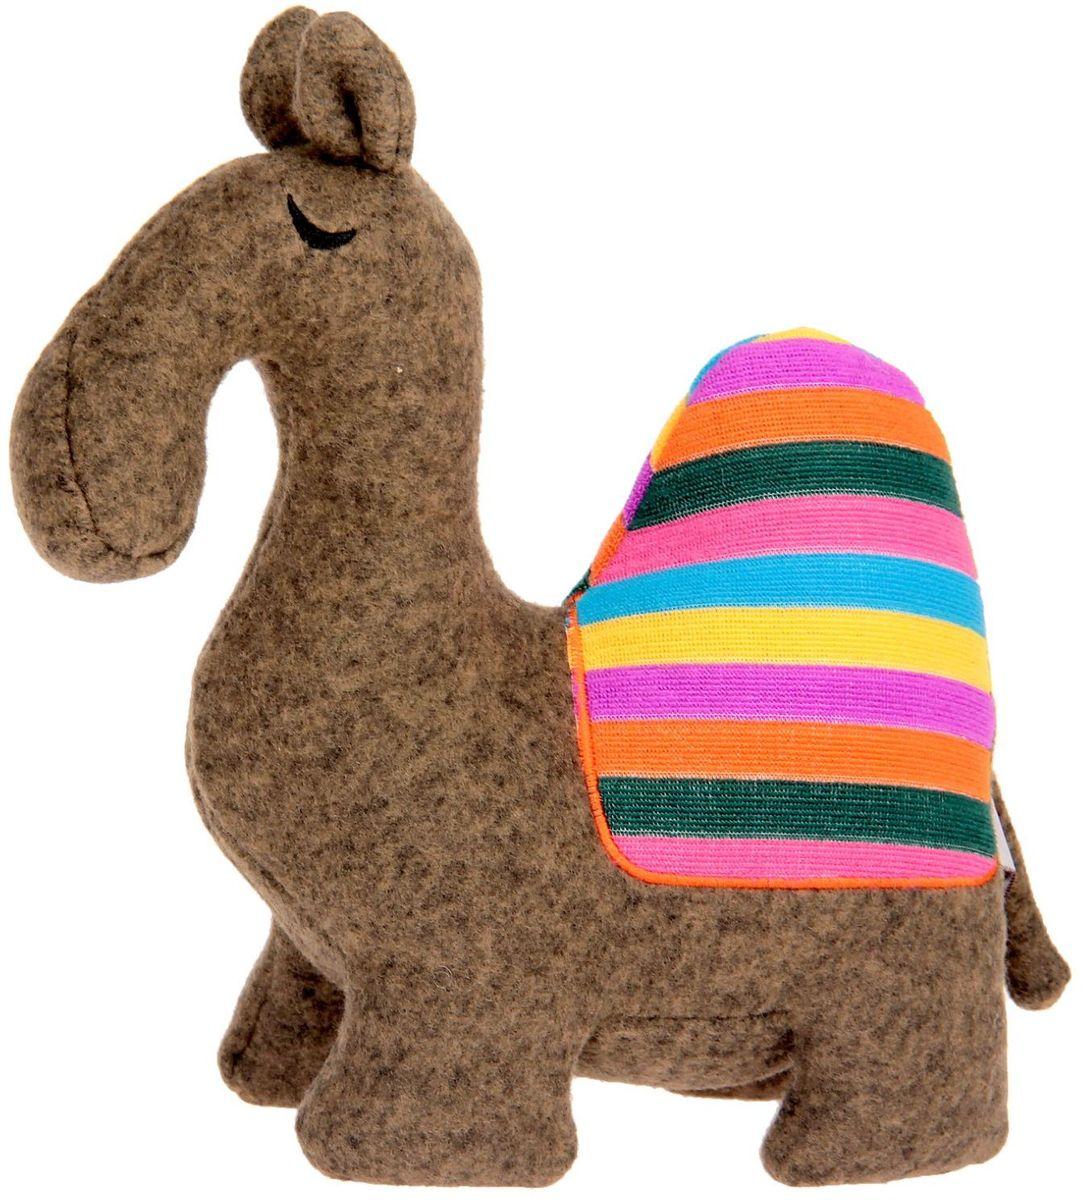 Zakazat.ru Gund Мягкая игрушка Верблюд Cho C 20,5 см 2245479